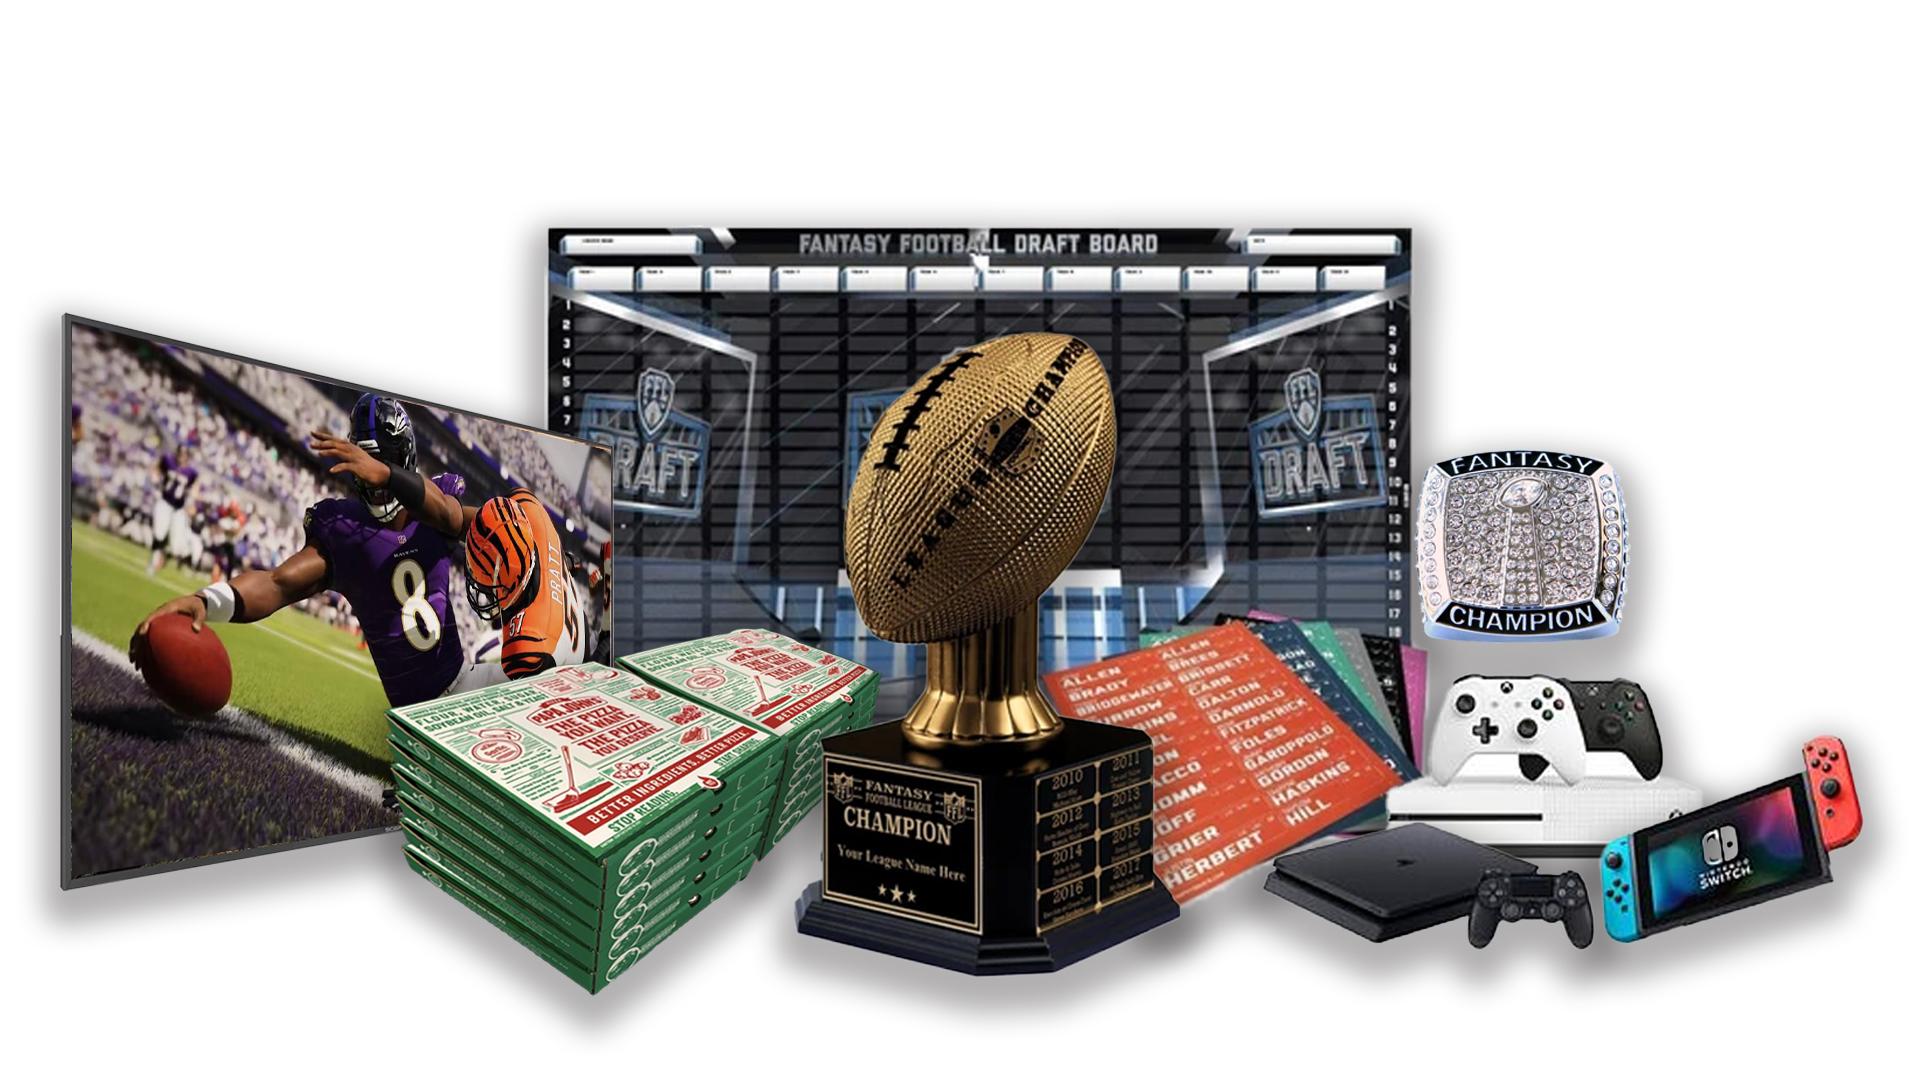 - FFDraft Trophy Gold Pizza2 - Fantasy Football Draft Parties at 1Life2Play